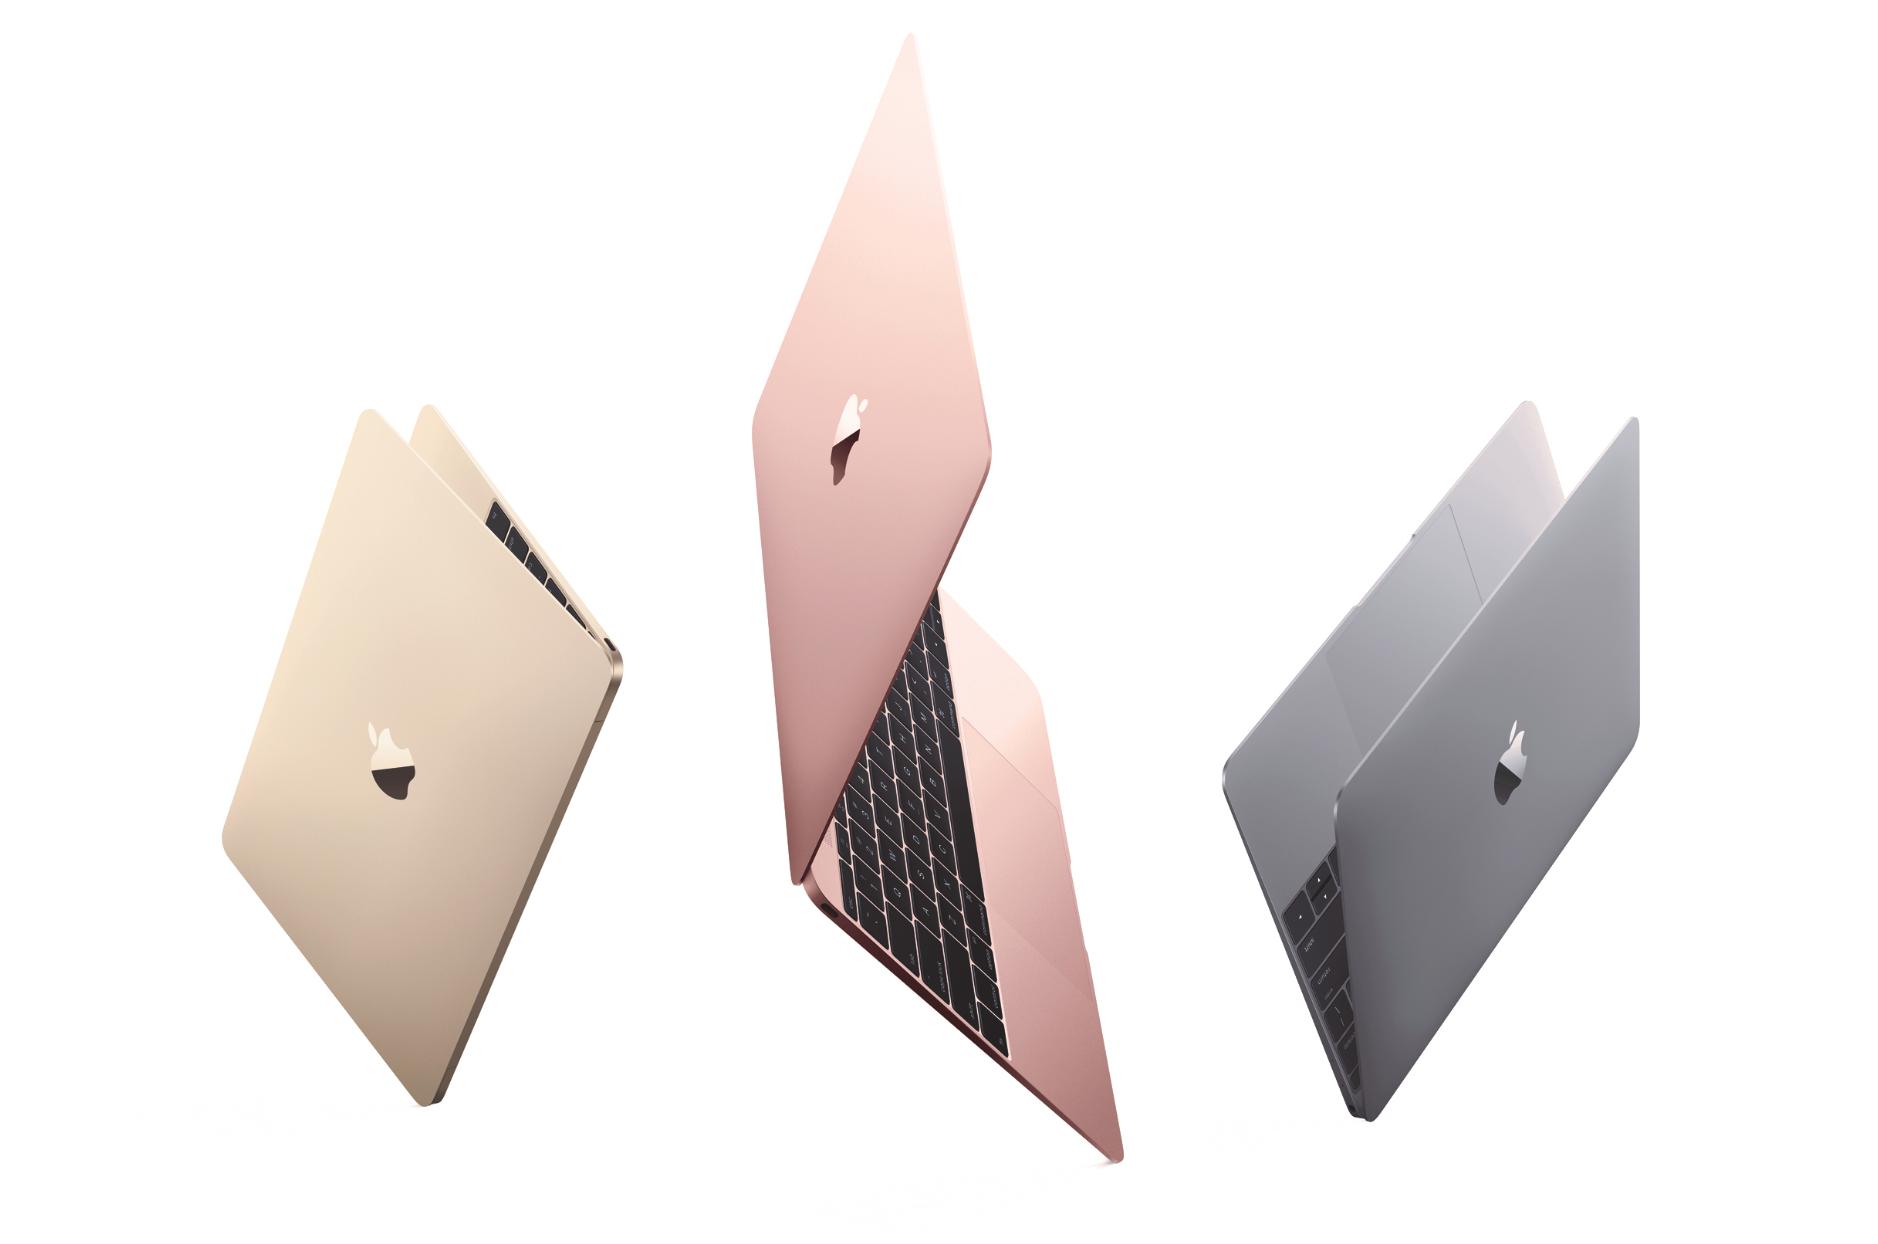 MacBook 12 inch 2016